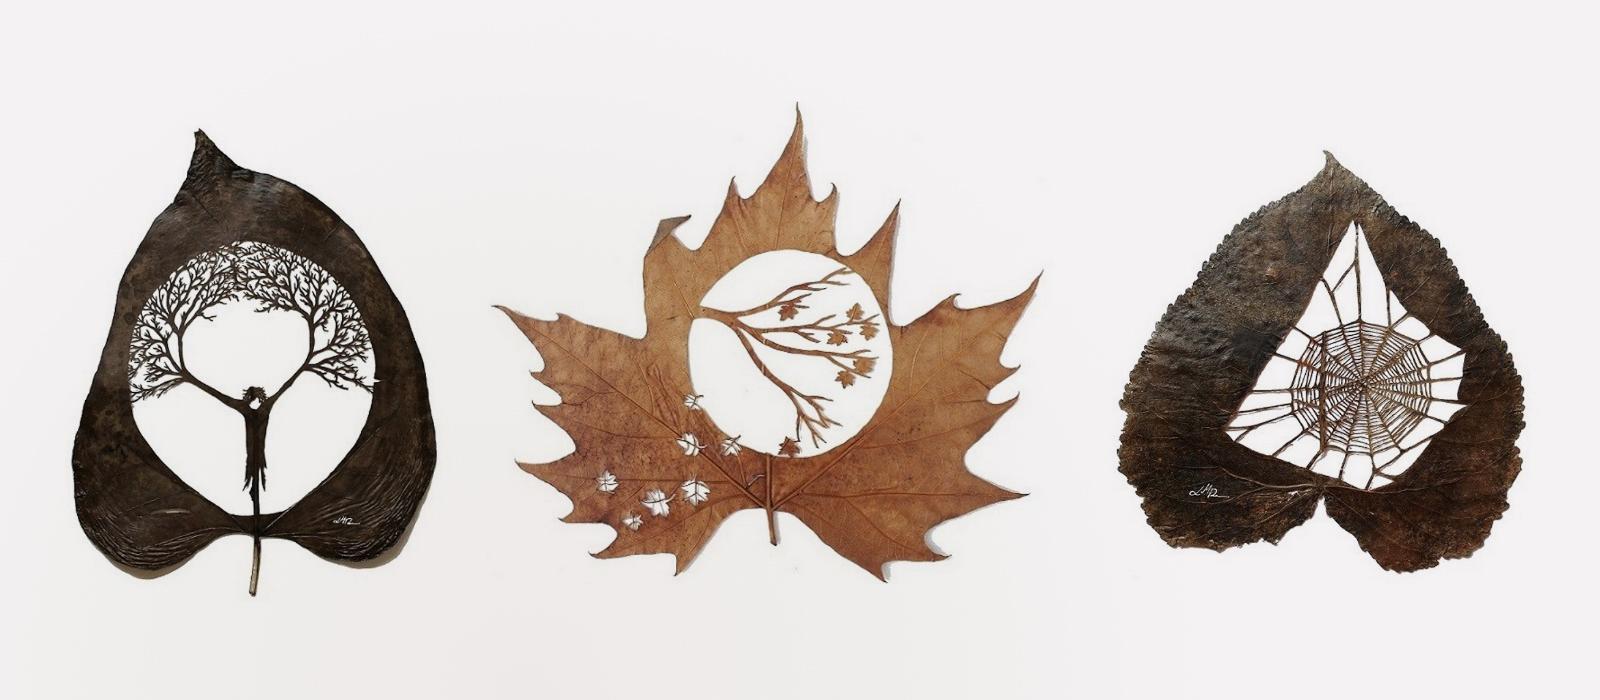 hojas perforadas cortadas